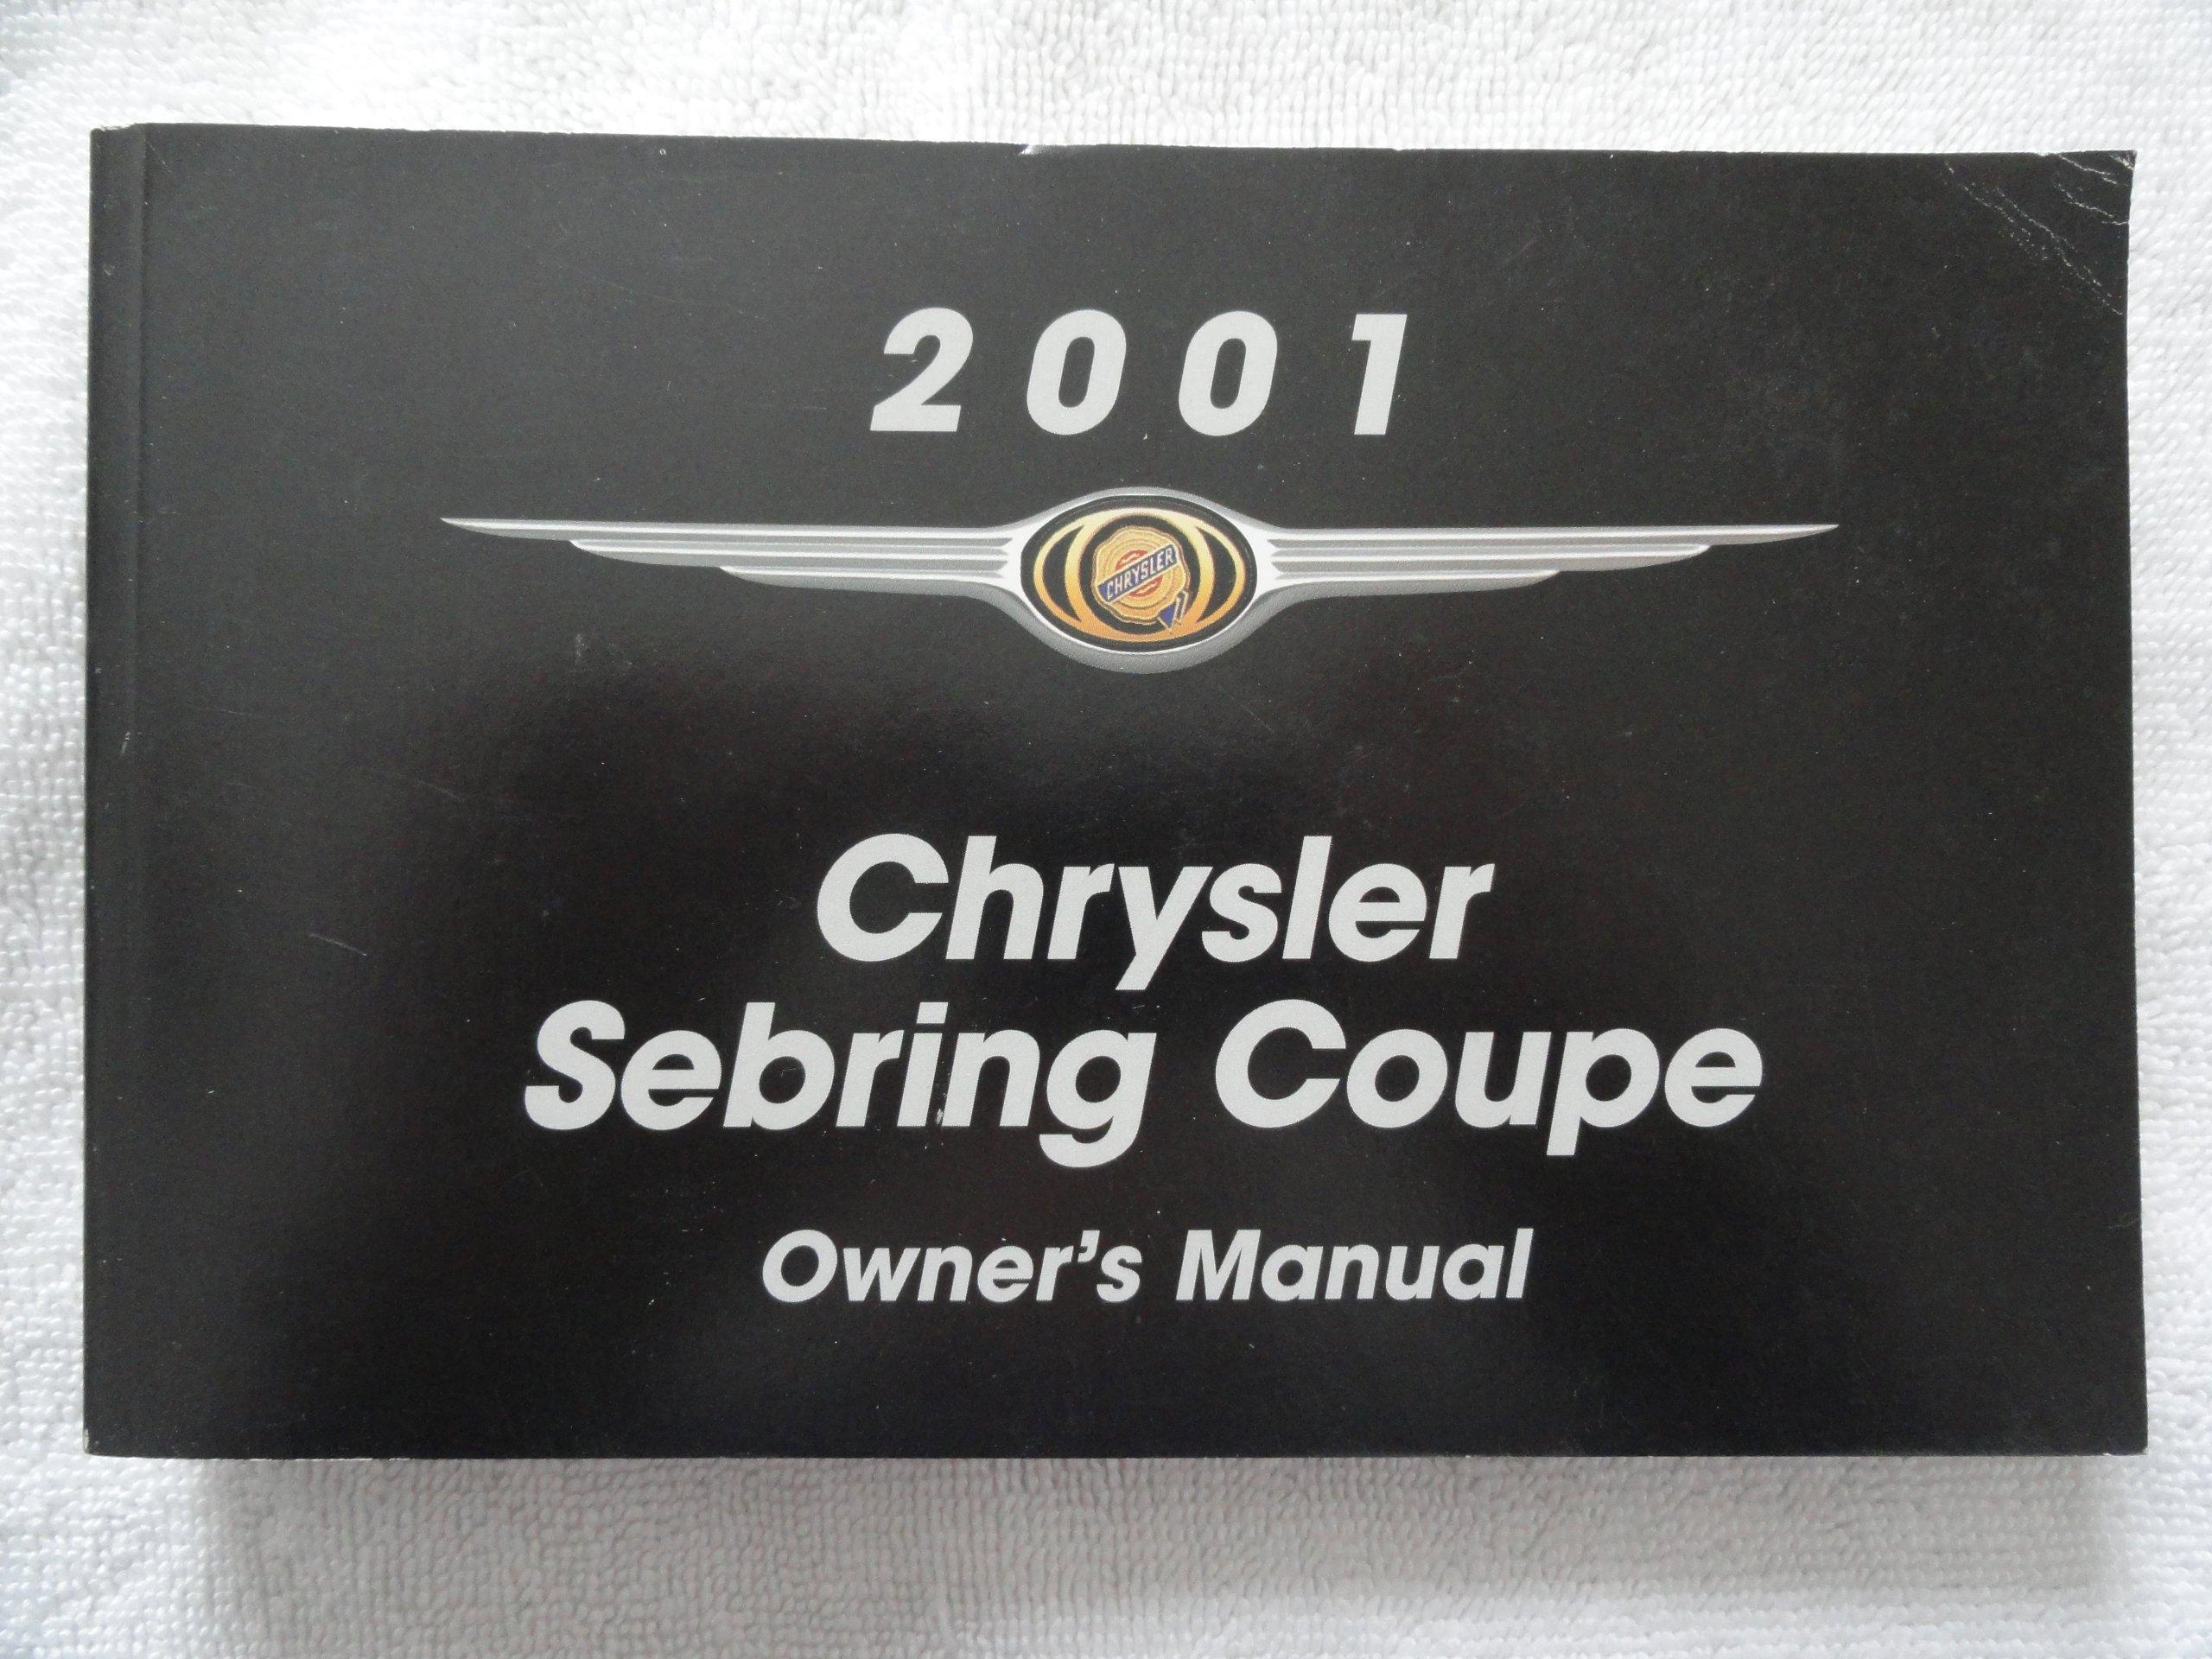 2001 chrysler sebring coupe owners manual chrysler amazon com books rh amazon com 2001 chrysler sebring convertible owners manual 2000 chrysler sebring owners manual